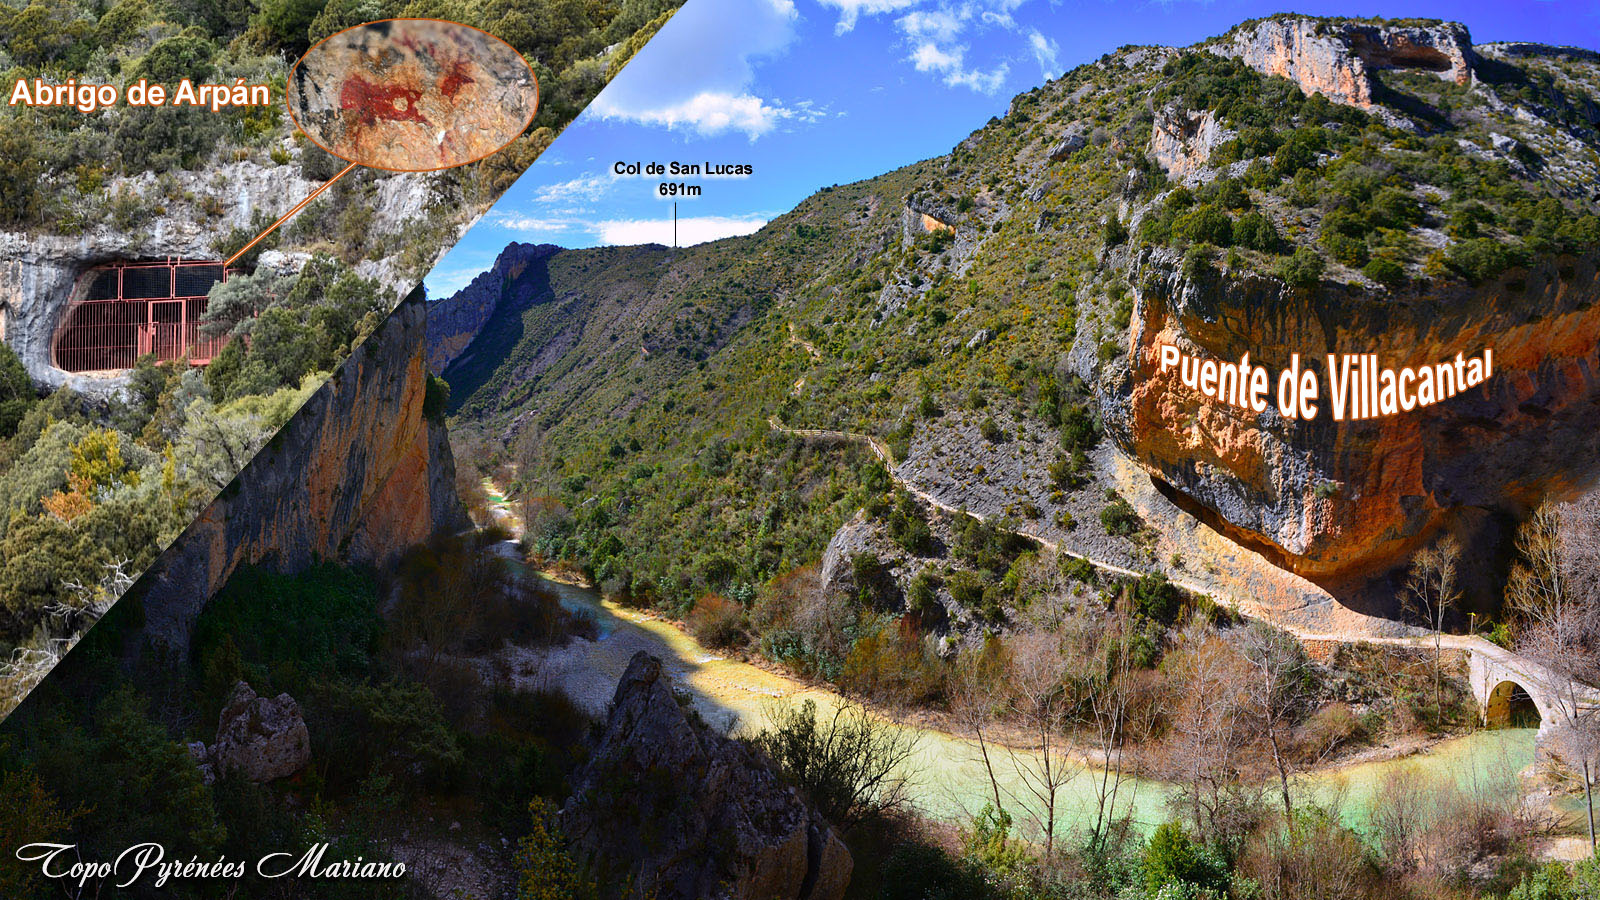 Pont Villacantal (540m) – Abri Arpán (740m)